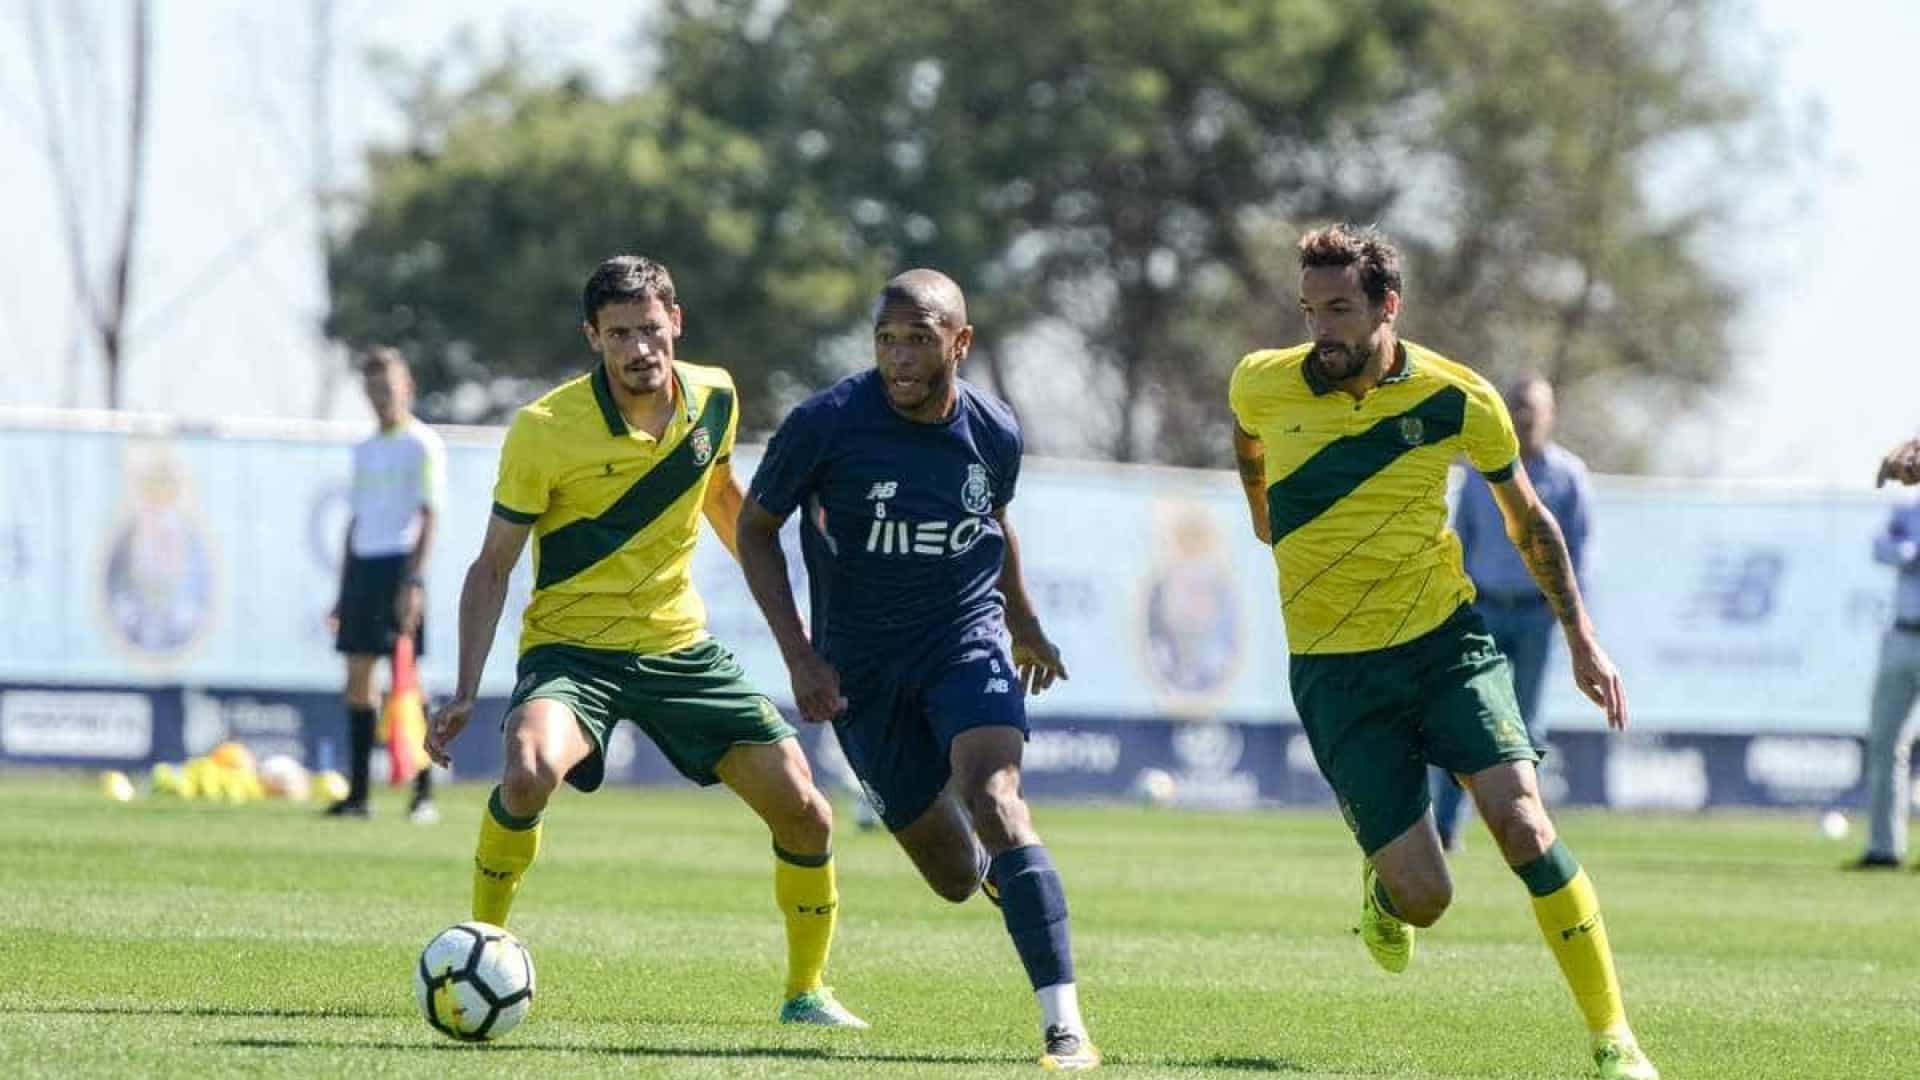 Hat-trick de Soares dá vitória aos dragões